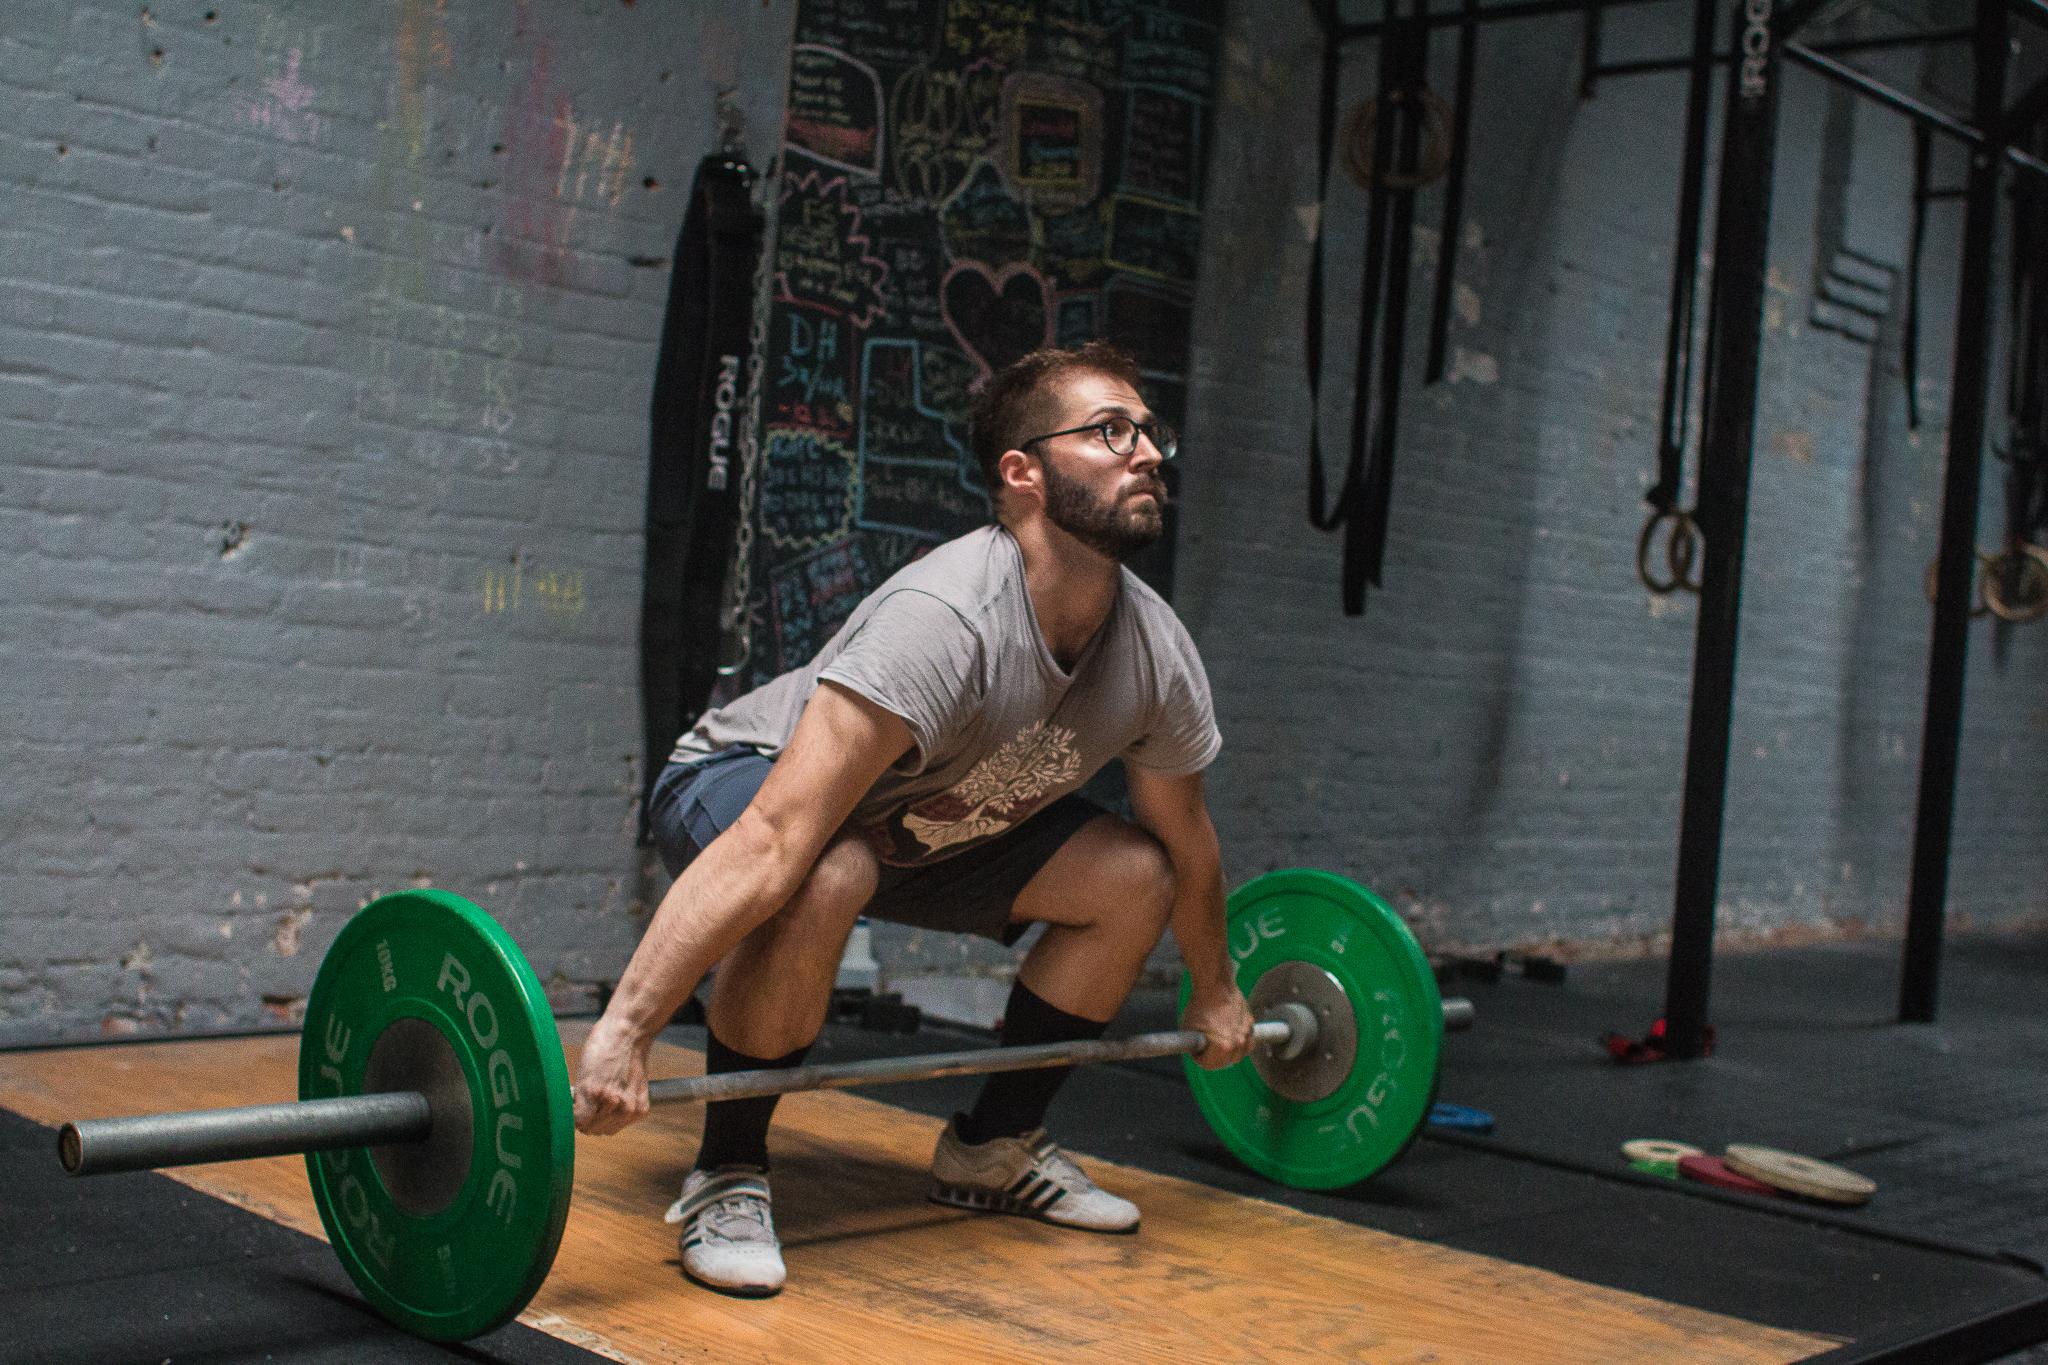 james-wright-visit-brooklyn-new-york-weightlifting-coach-teammates-october-2016 (43 of 92).jpg